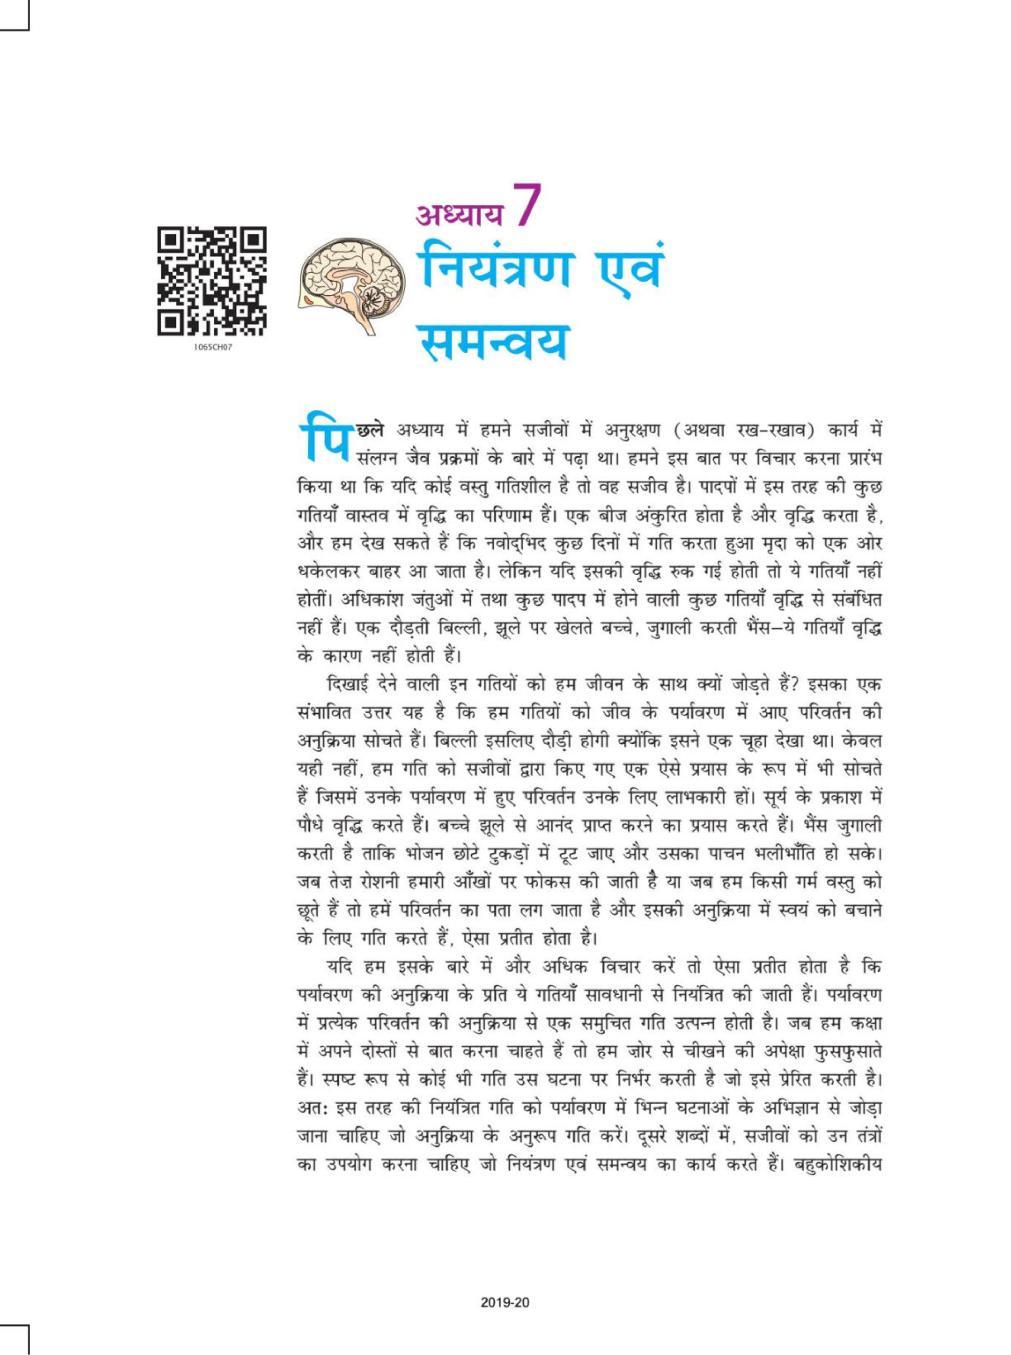 NCERT Book Class 10 Science (विज्ञान) Chapter 7 नियंत्रण एवं समन्वय - Page 1